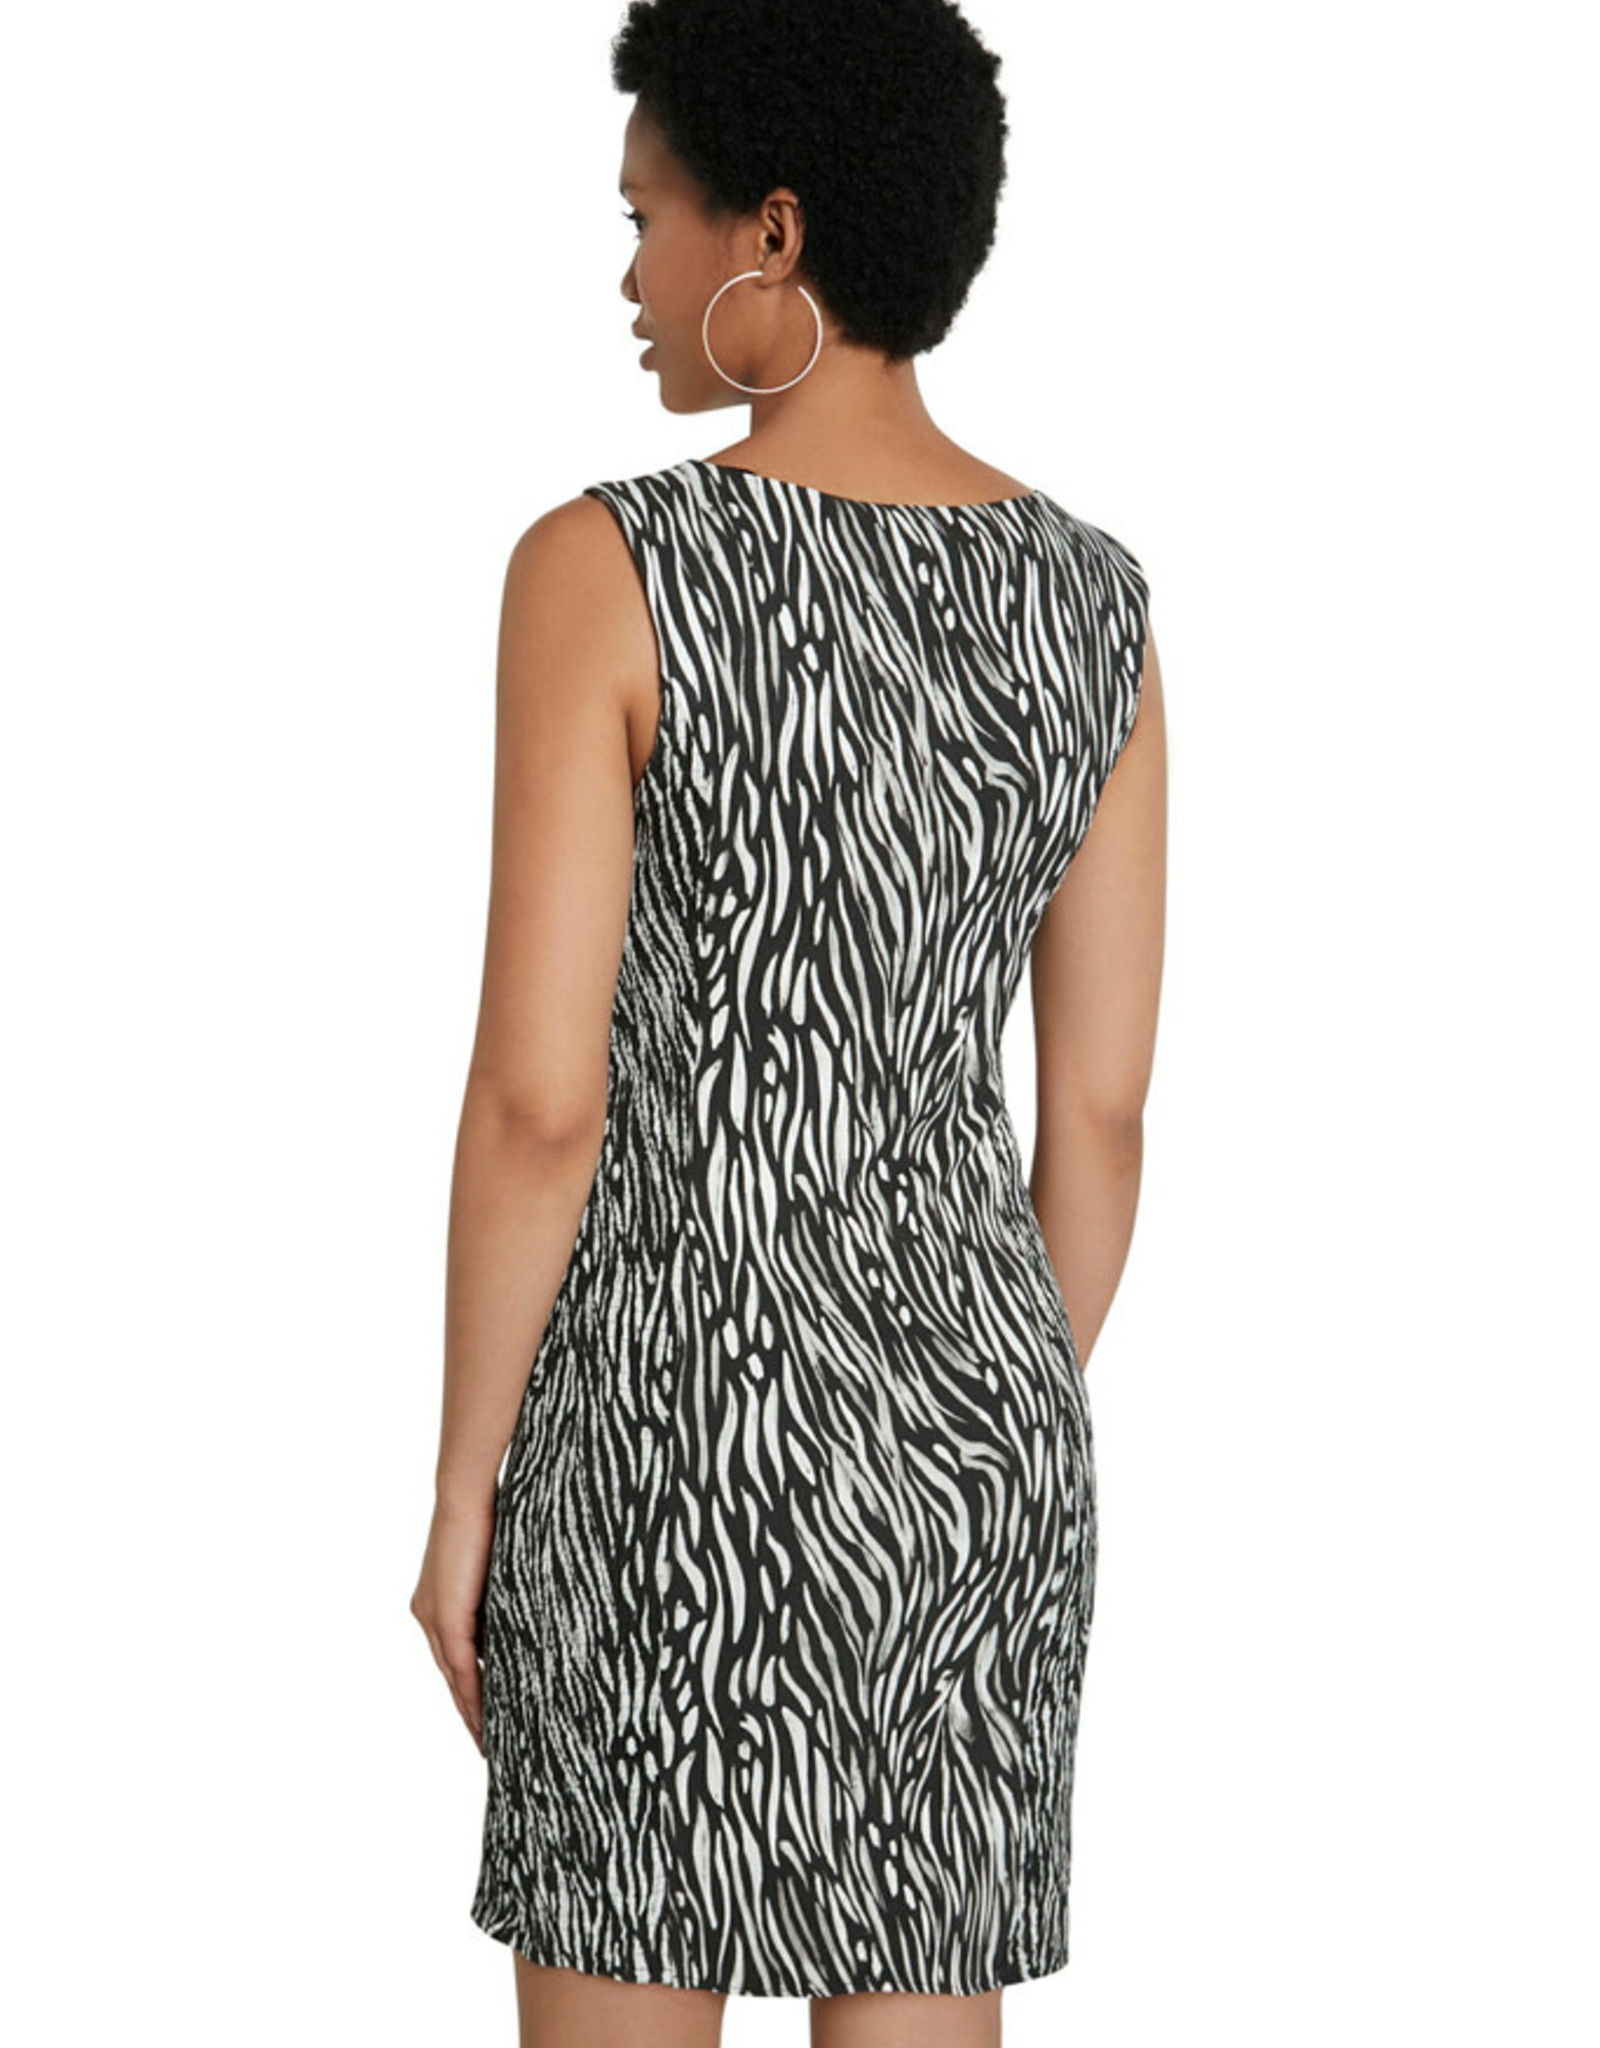 DESIG 21SWVW18 2000 Salt Lake City Black Dress